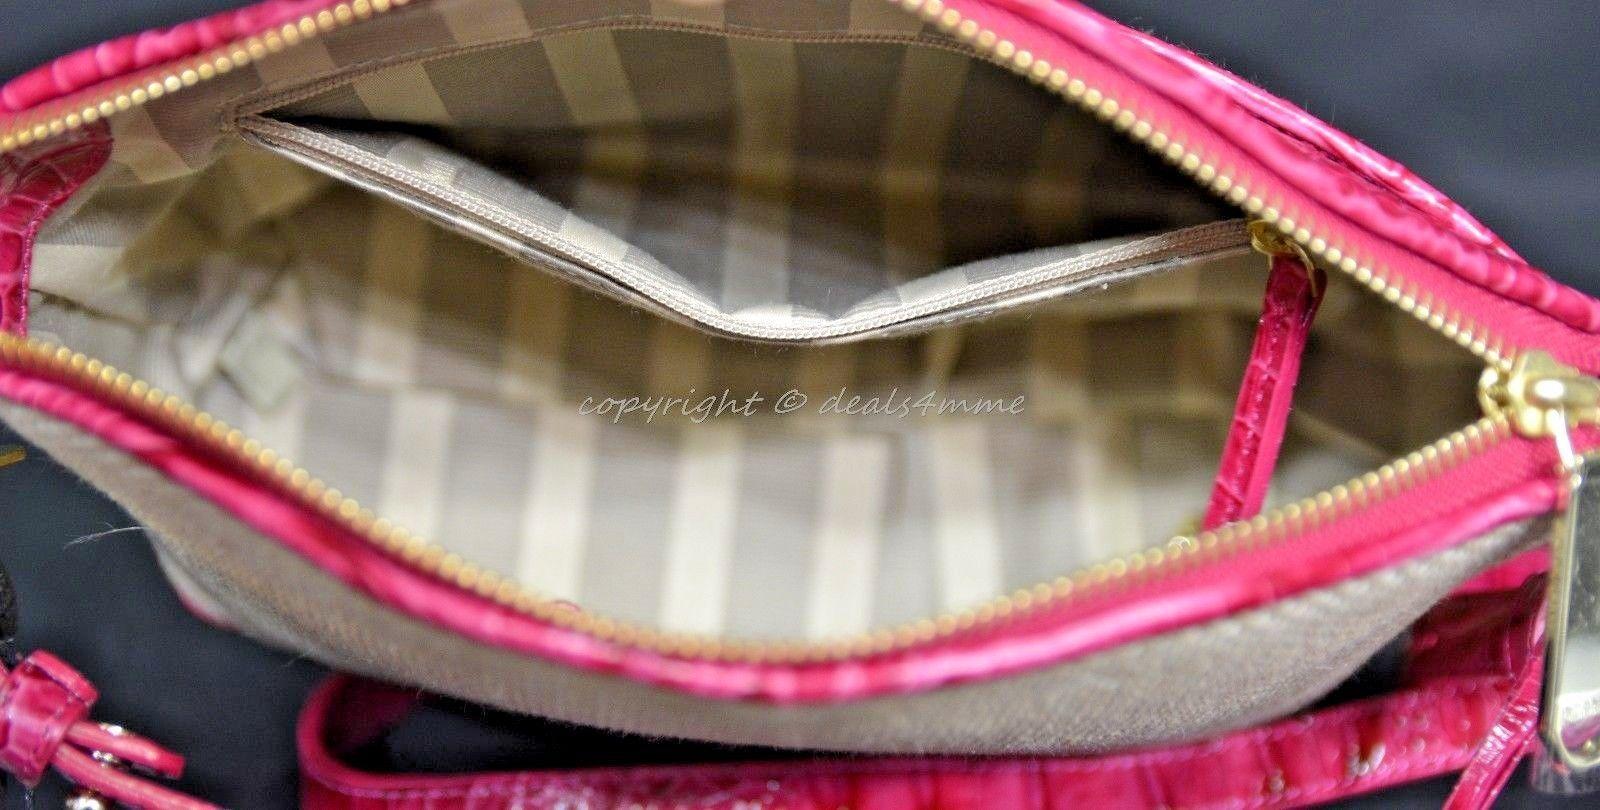 NWT Brahmin Mini Duxbury Shoulder Bag in Punch Harbor, Pink Leather/Beige Fabric image 4